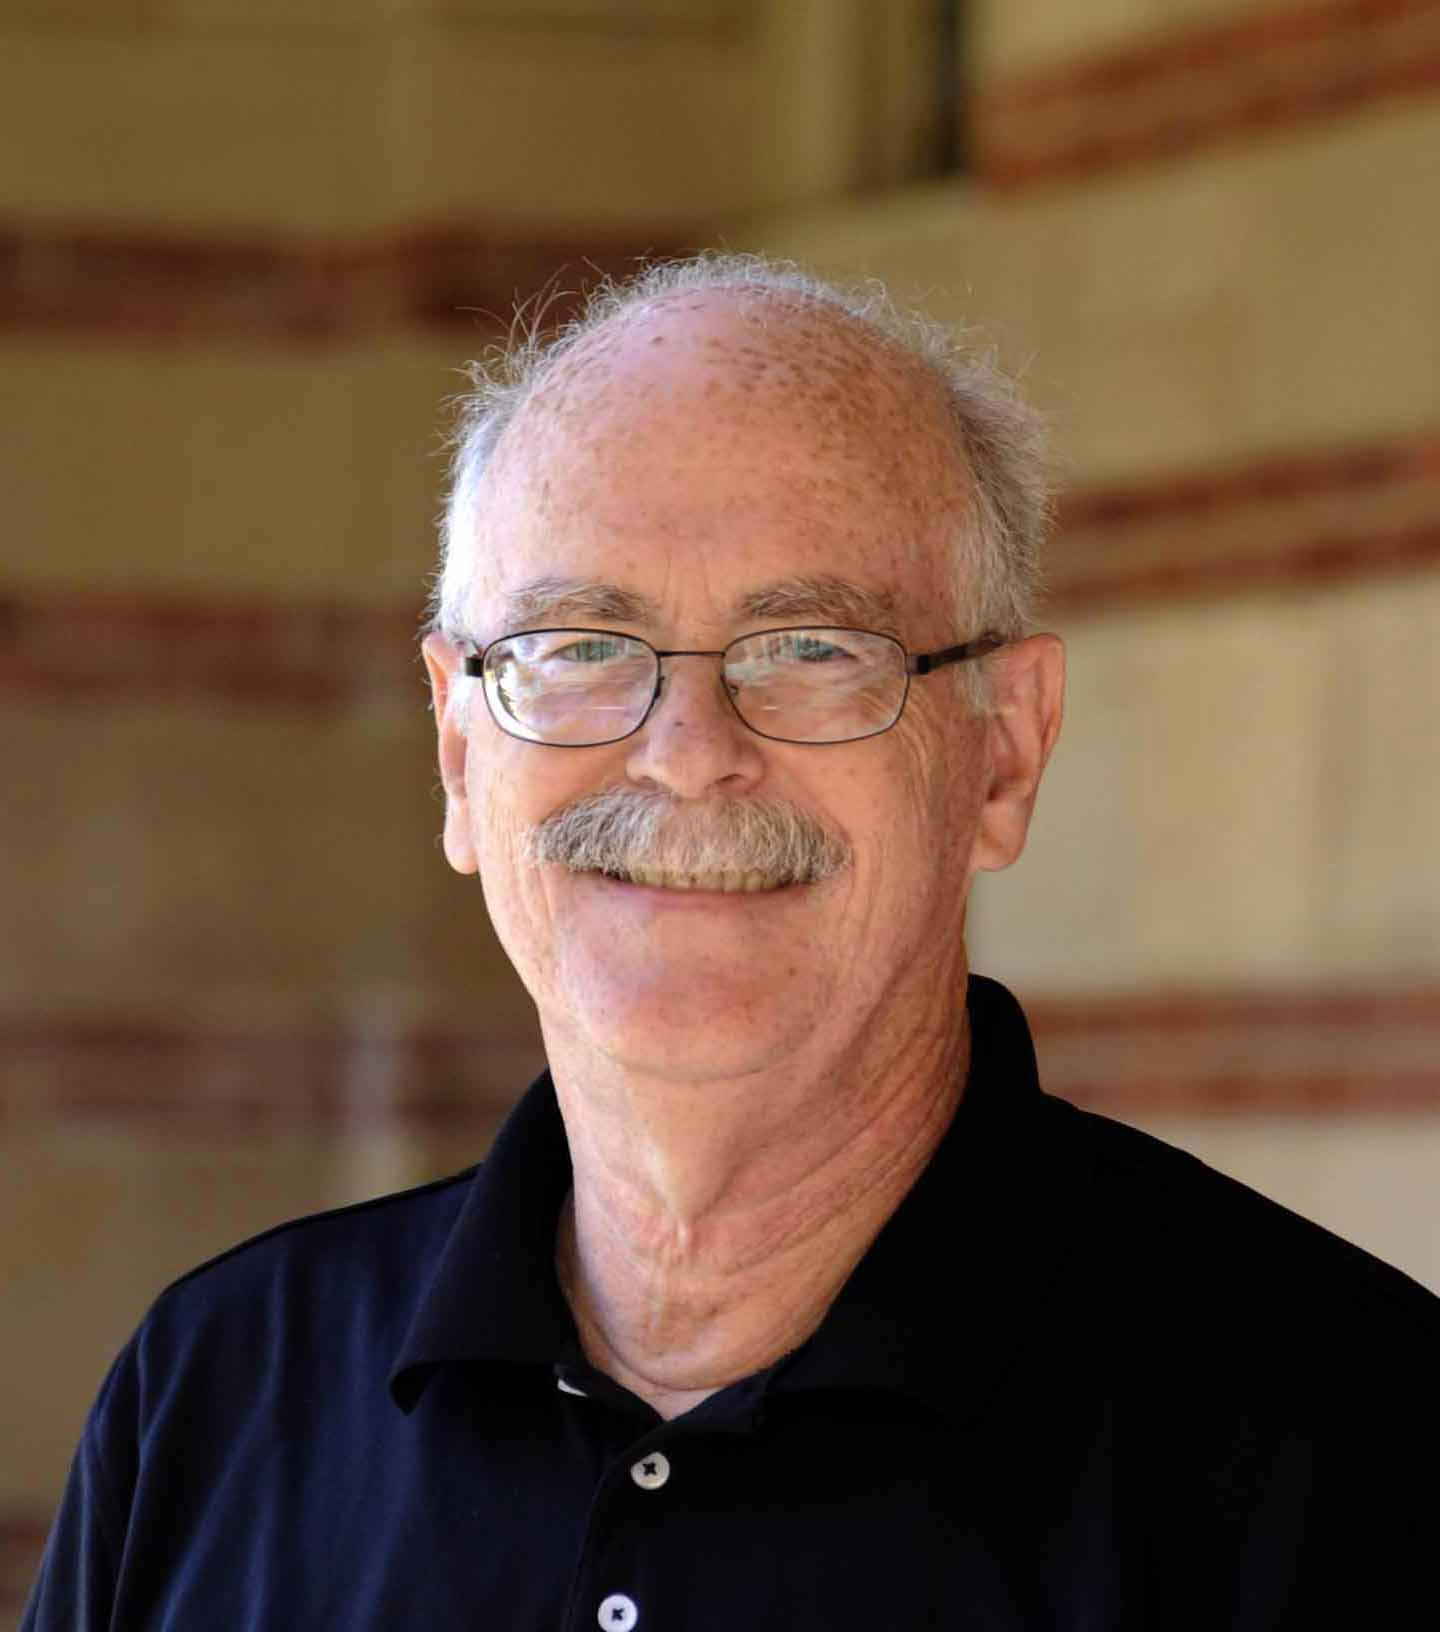 Faculty Database Production Server | David Geffen School of